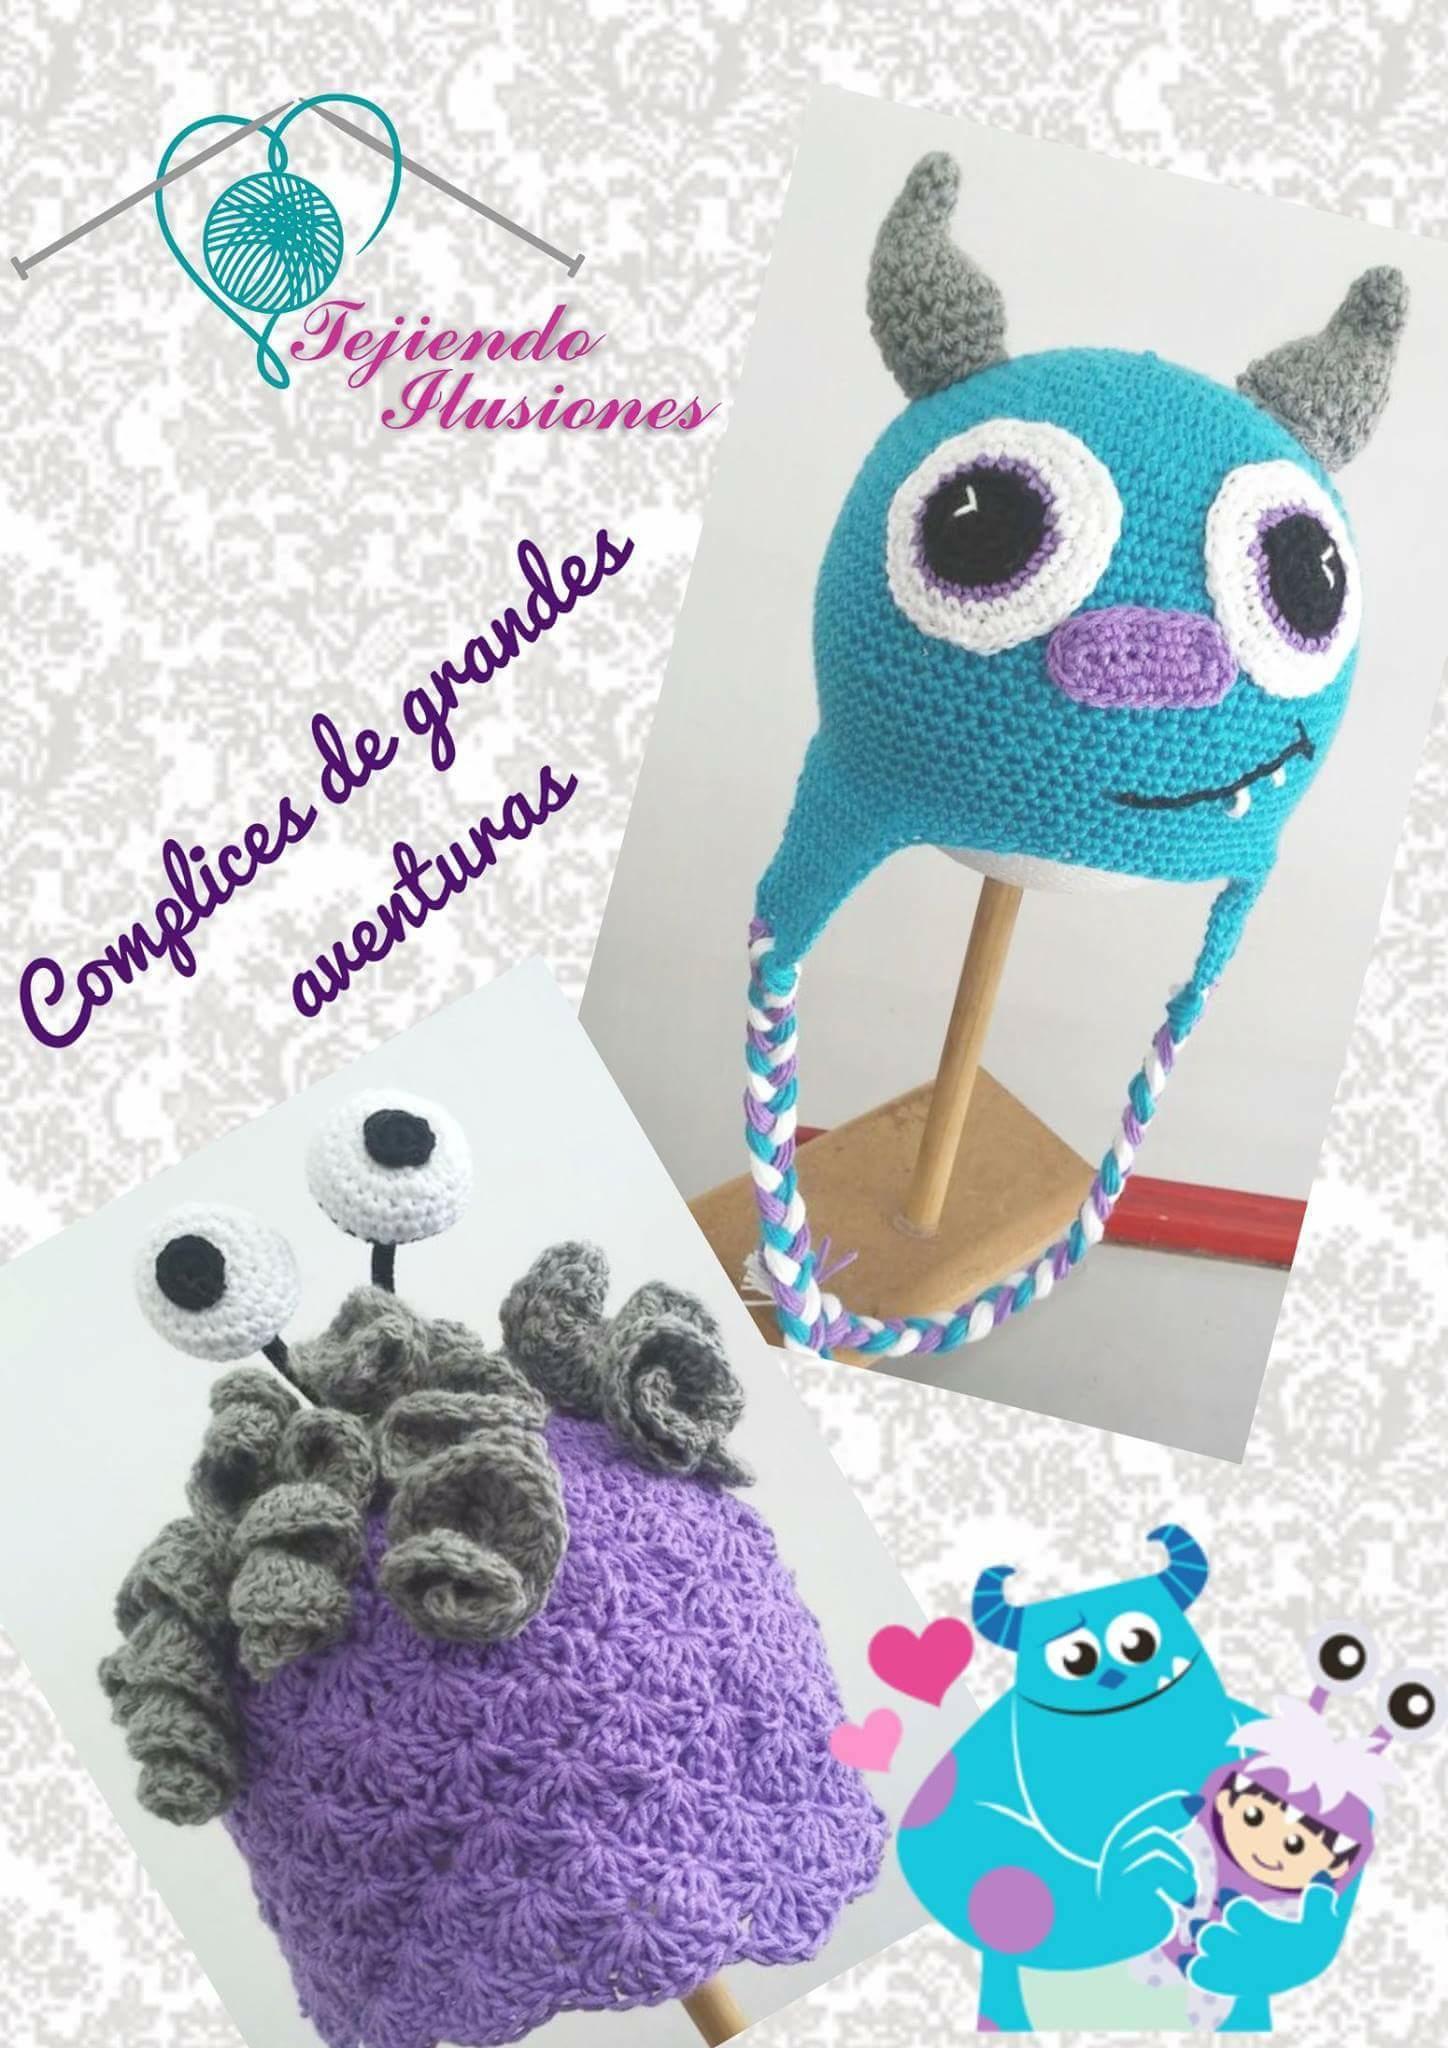 Modelo: Monster inc #Sullivan #Boo #Crochet #Ganchillo #Oaxaca ...